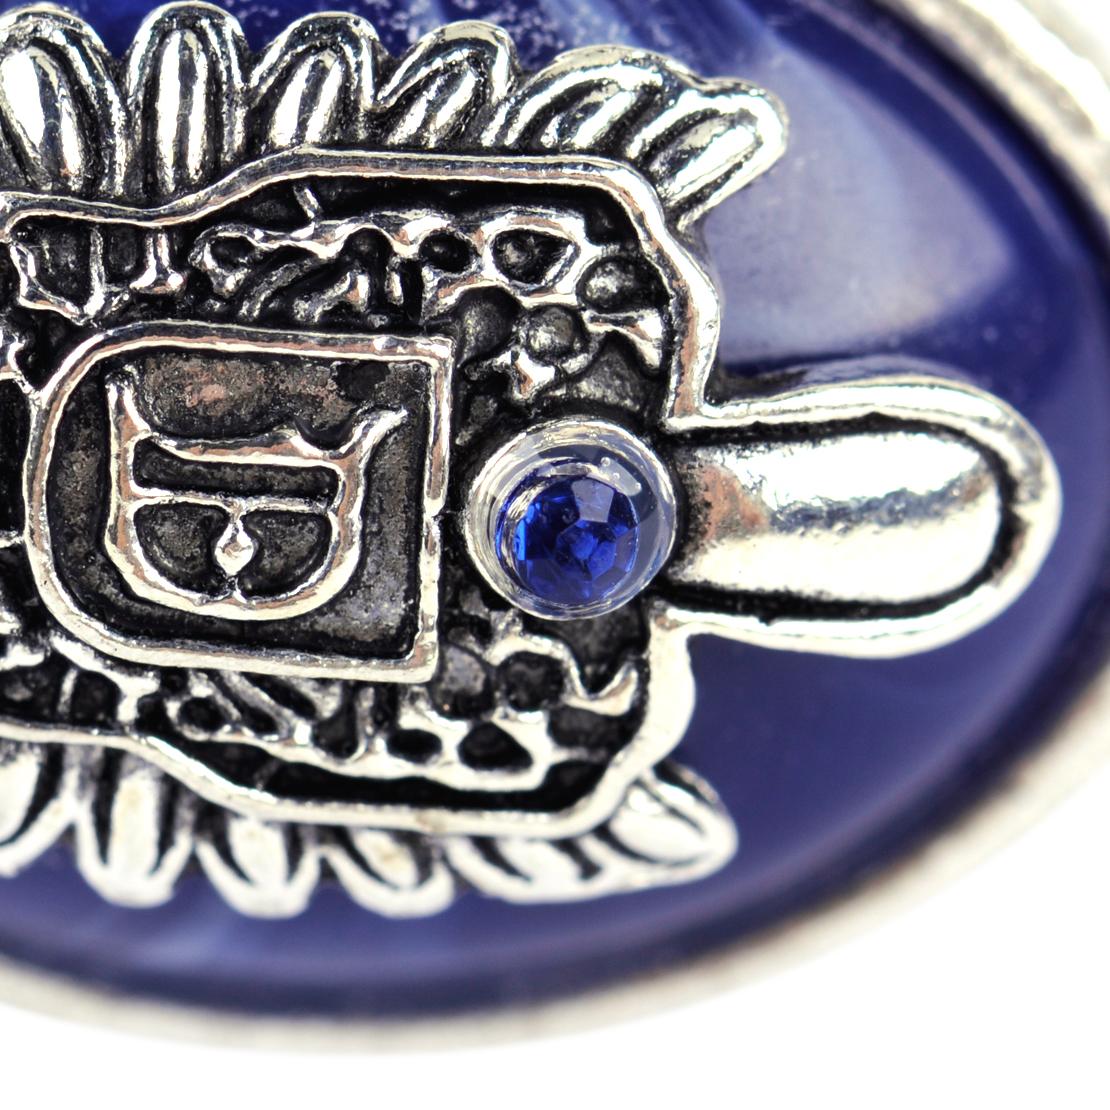 2017 Damen Ring Geschenke The Vampire Diaries Finger Familie Wappen Einzig @net